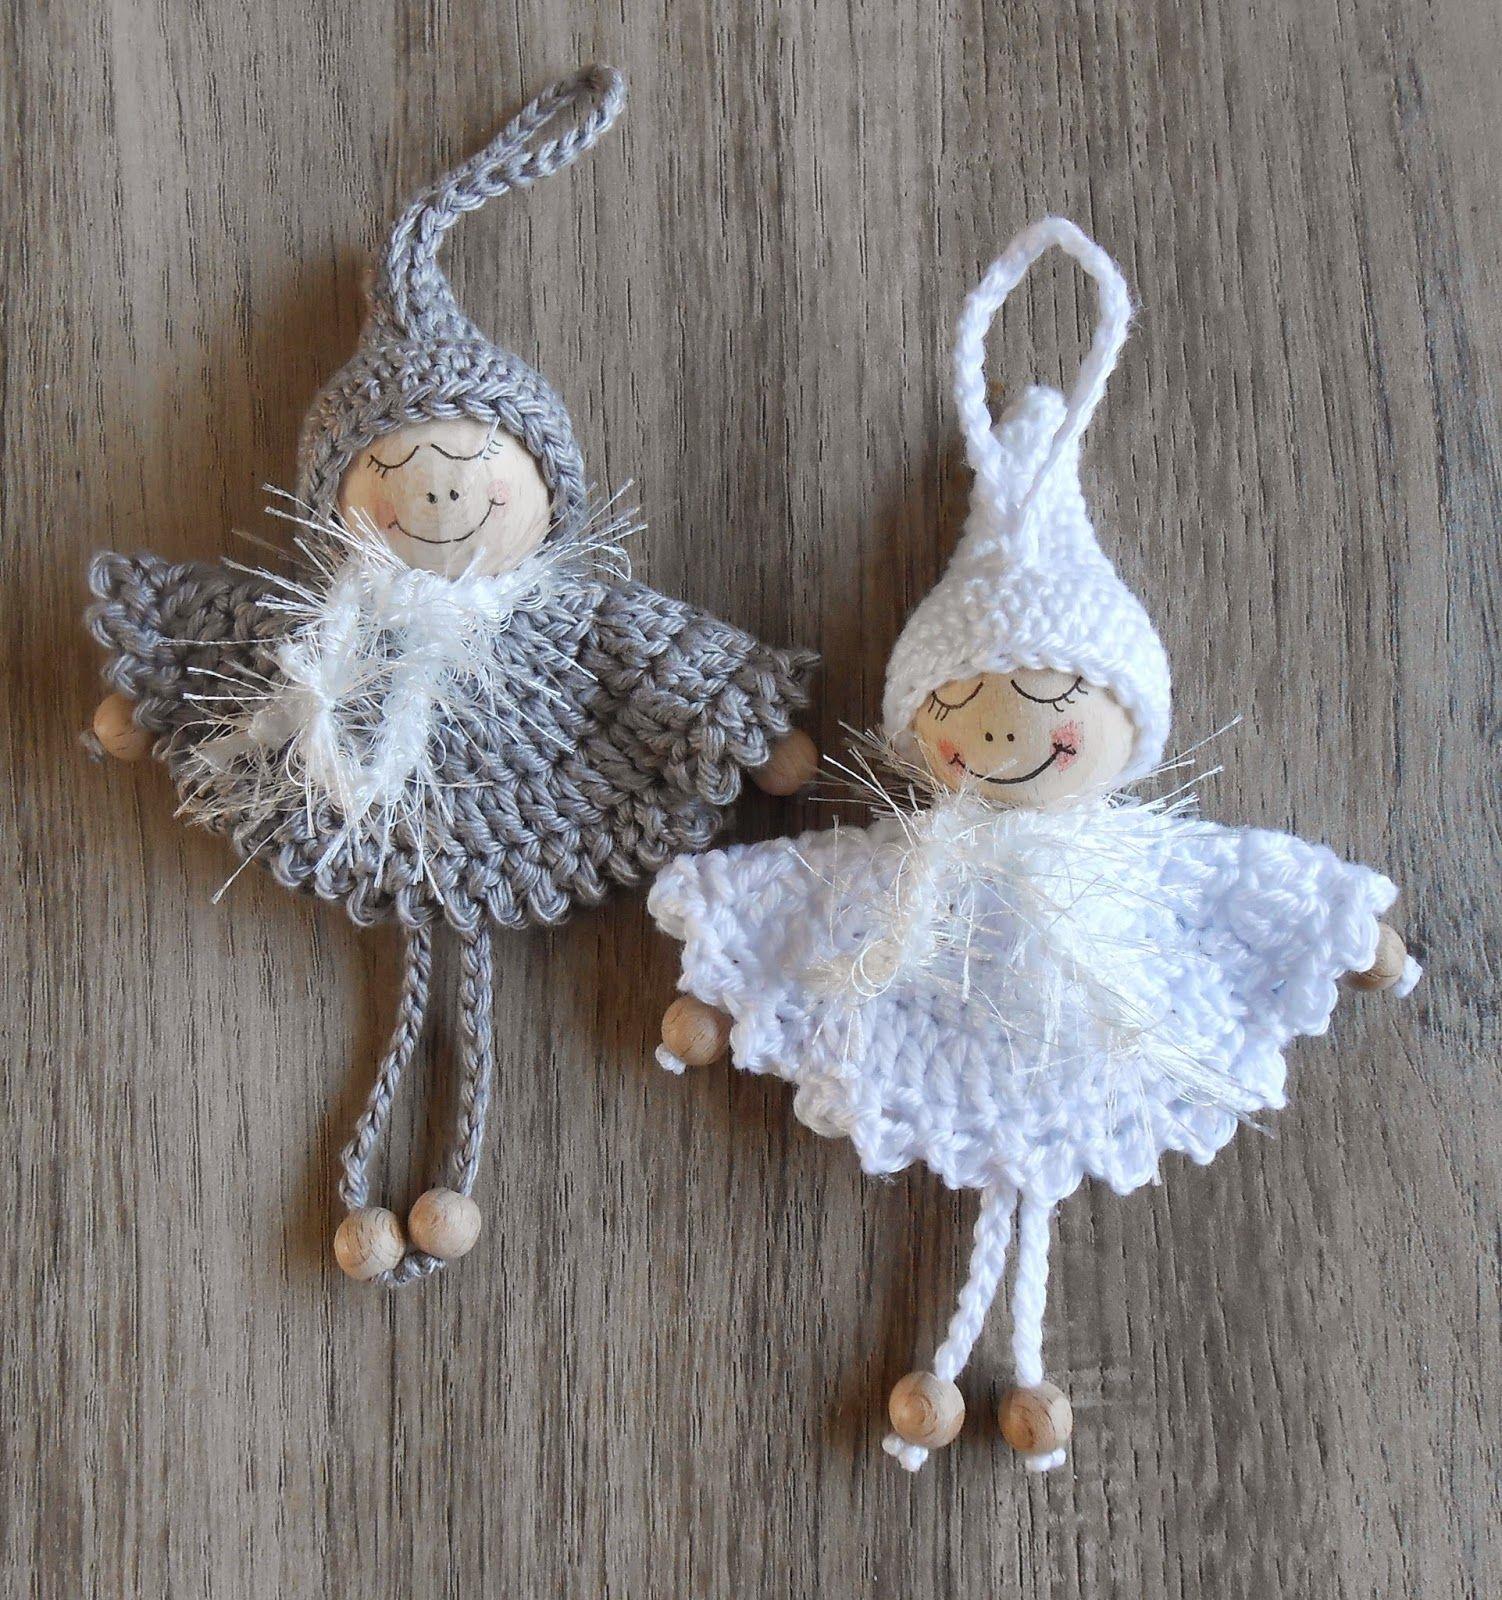 bizzy bee klaske druk bezig crochet knitting crochet. Black Bedroom Furniture Sets. Home Design Ideas